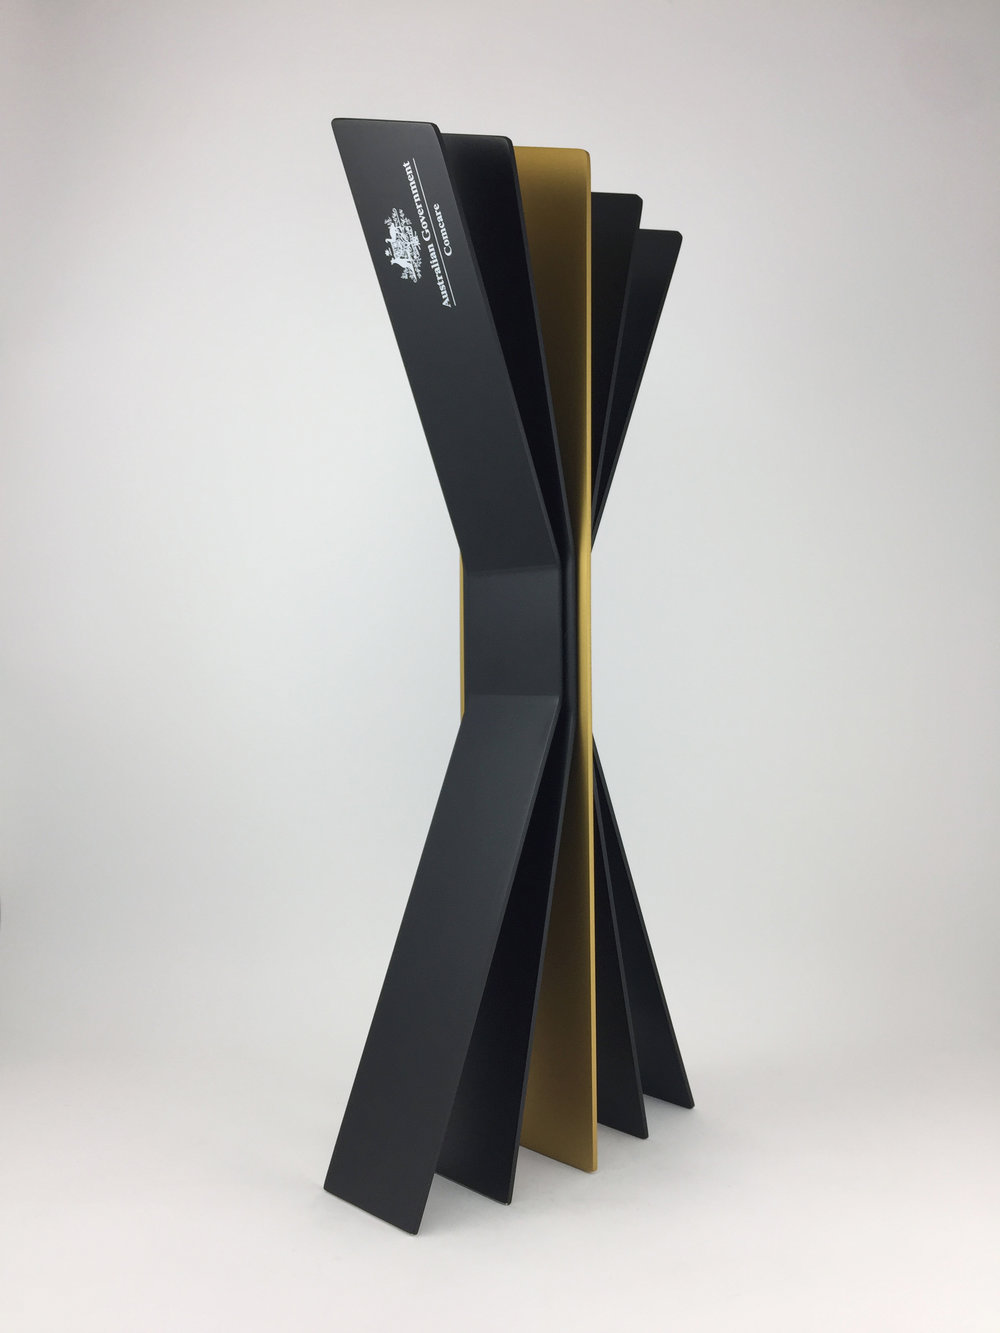 comcare-aluminium-award-trophy-04.jpg